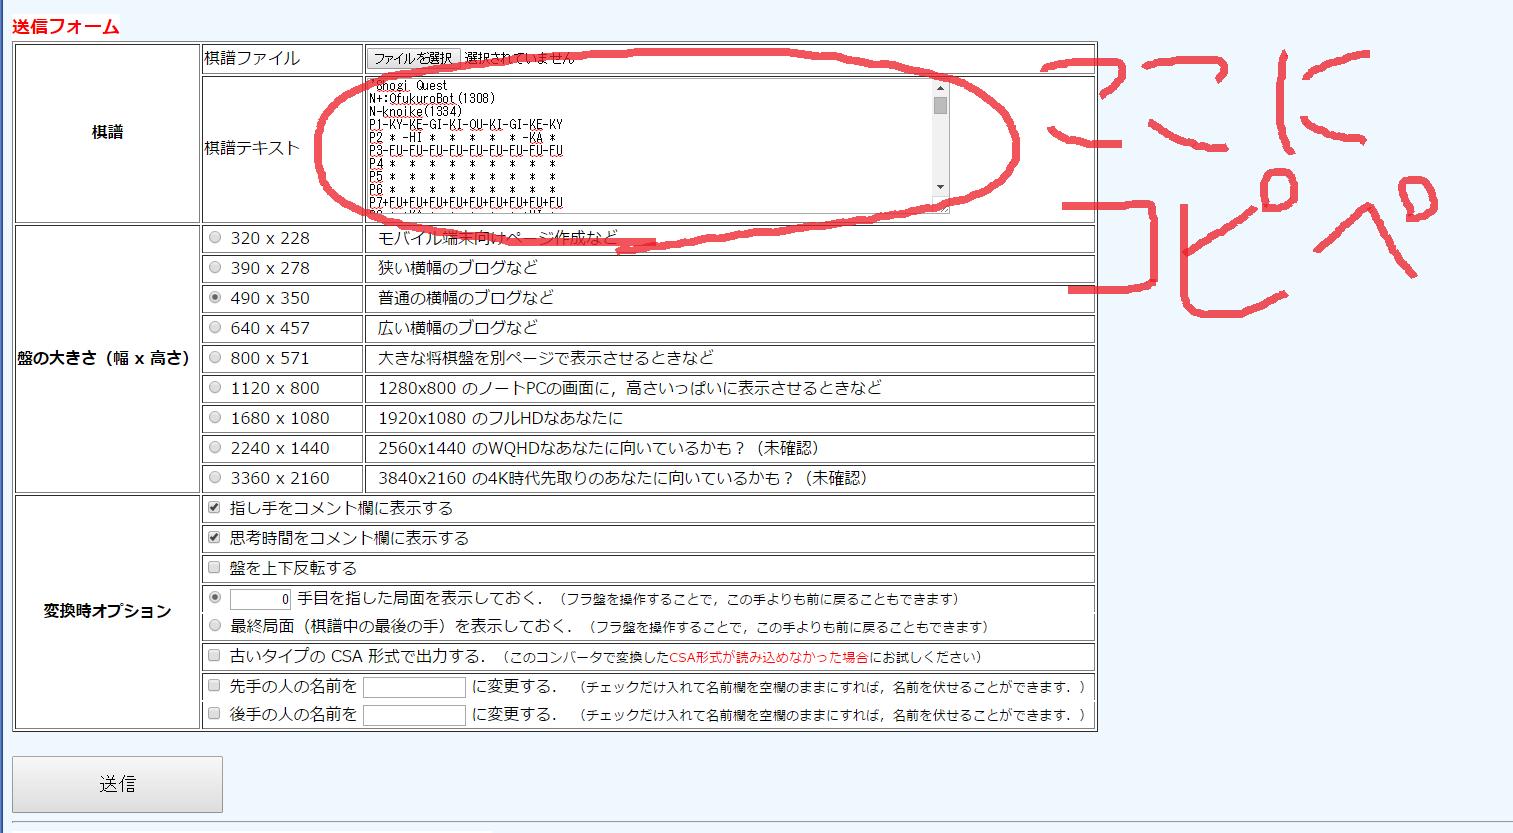 kifup_form_input.png